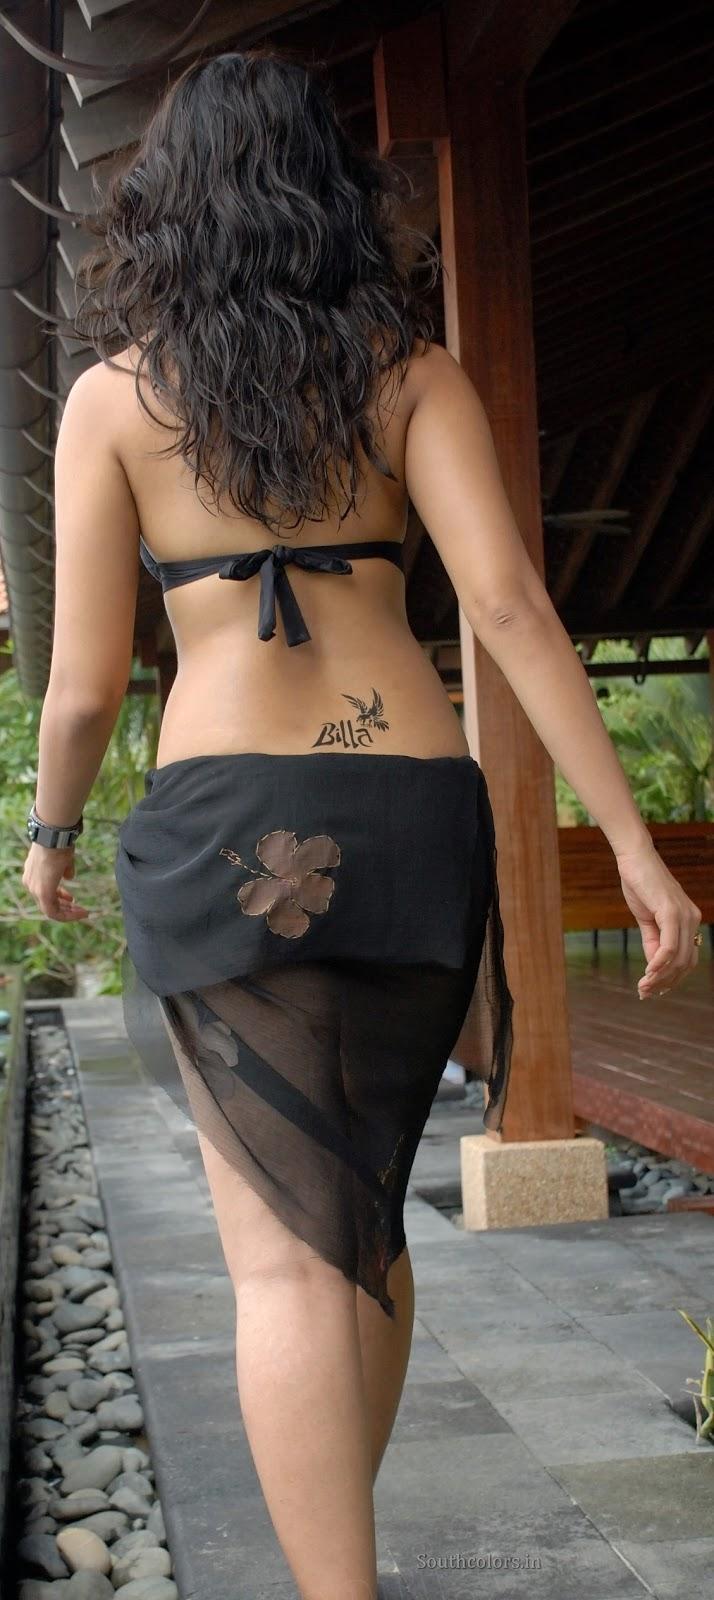 actress anushka shetty hot bikini navel show photos southcolors 10